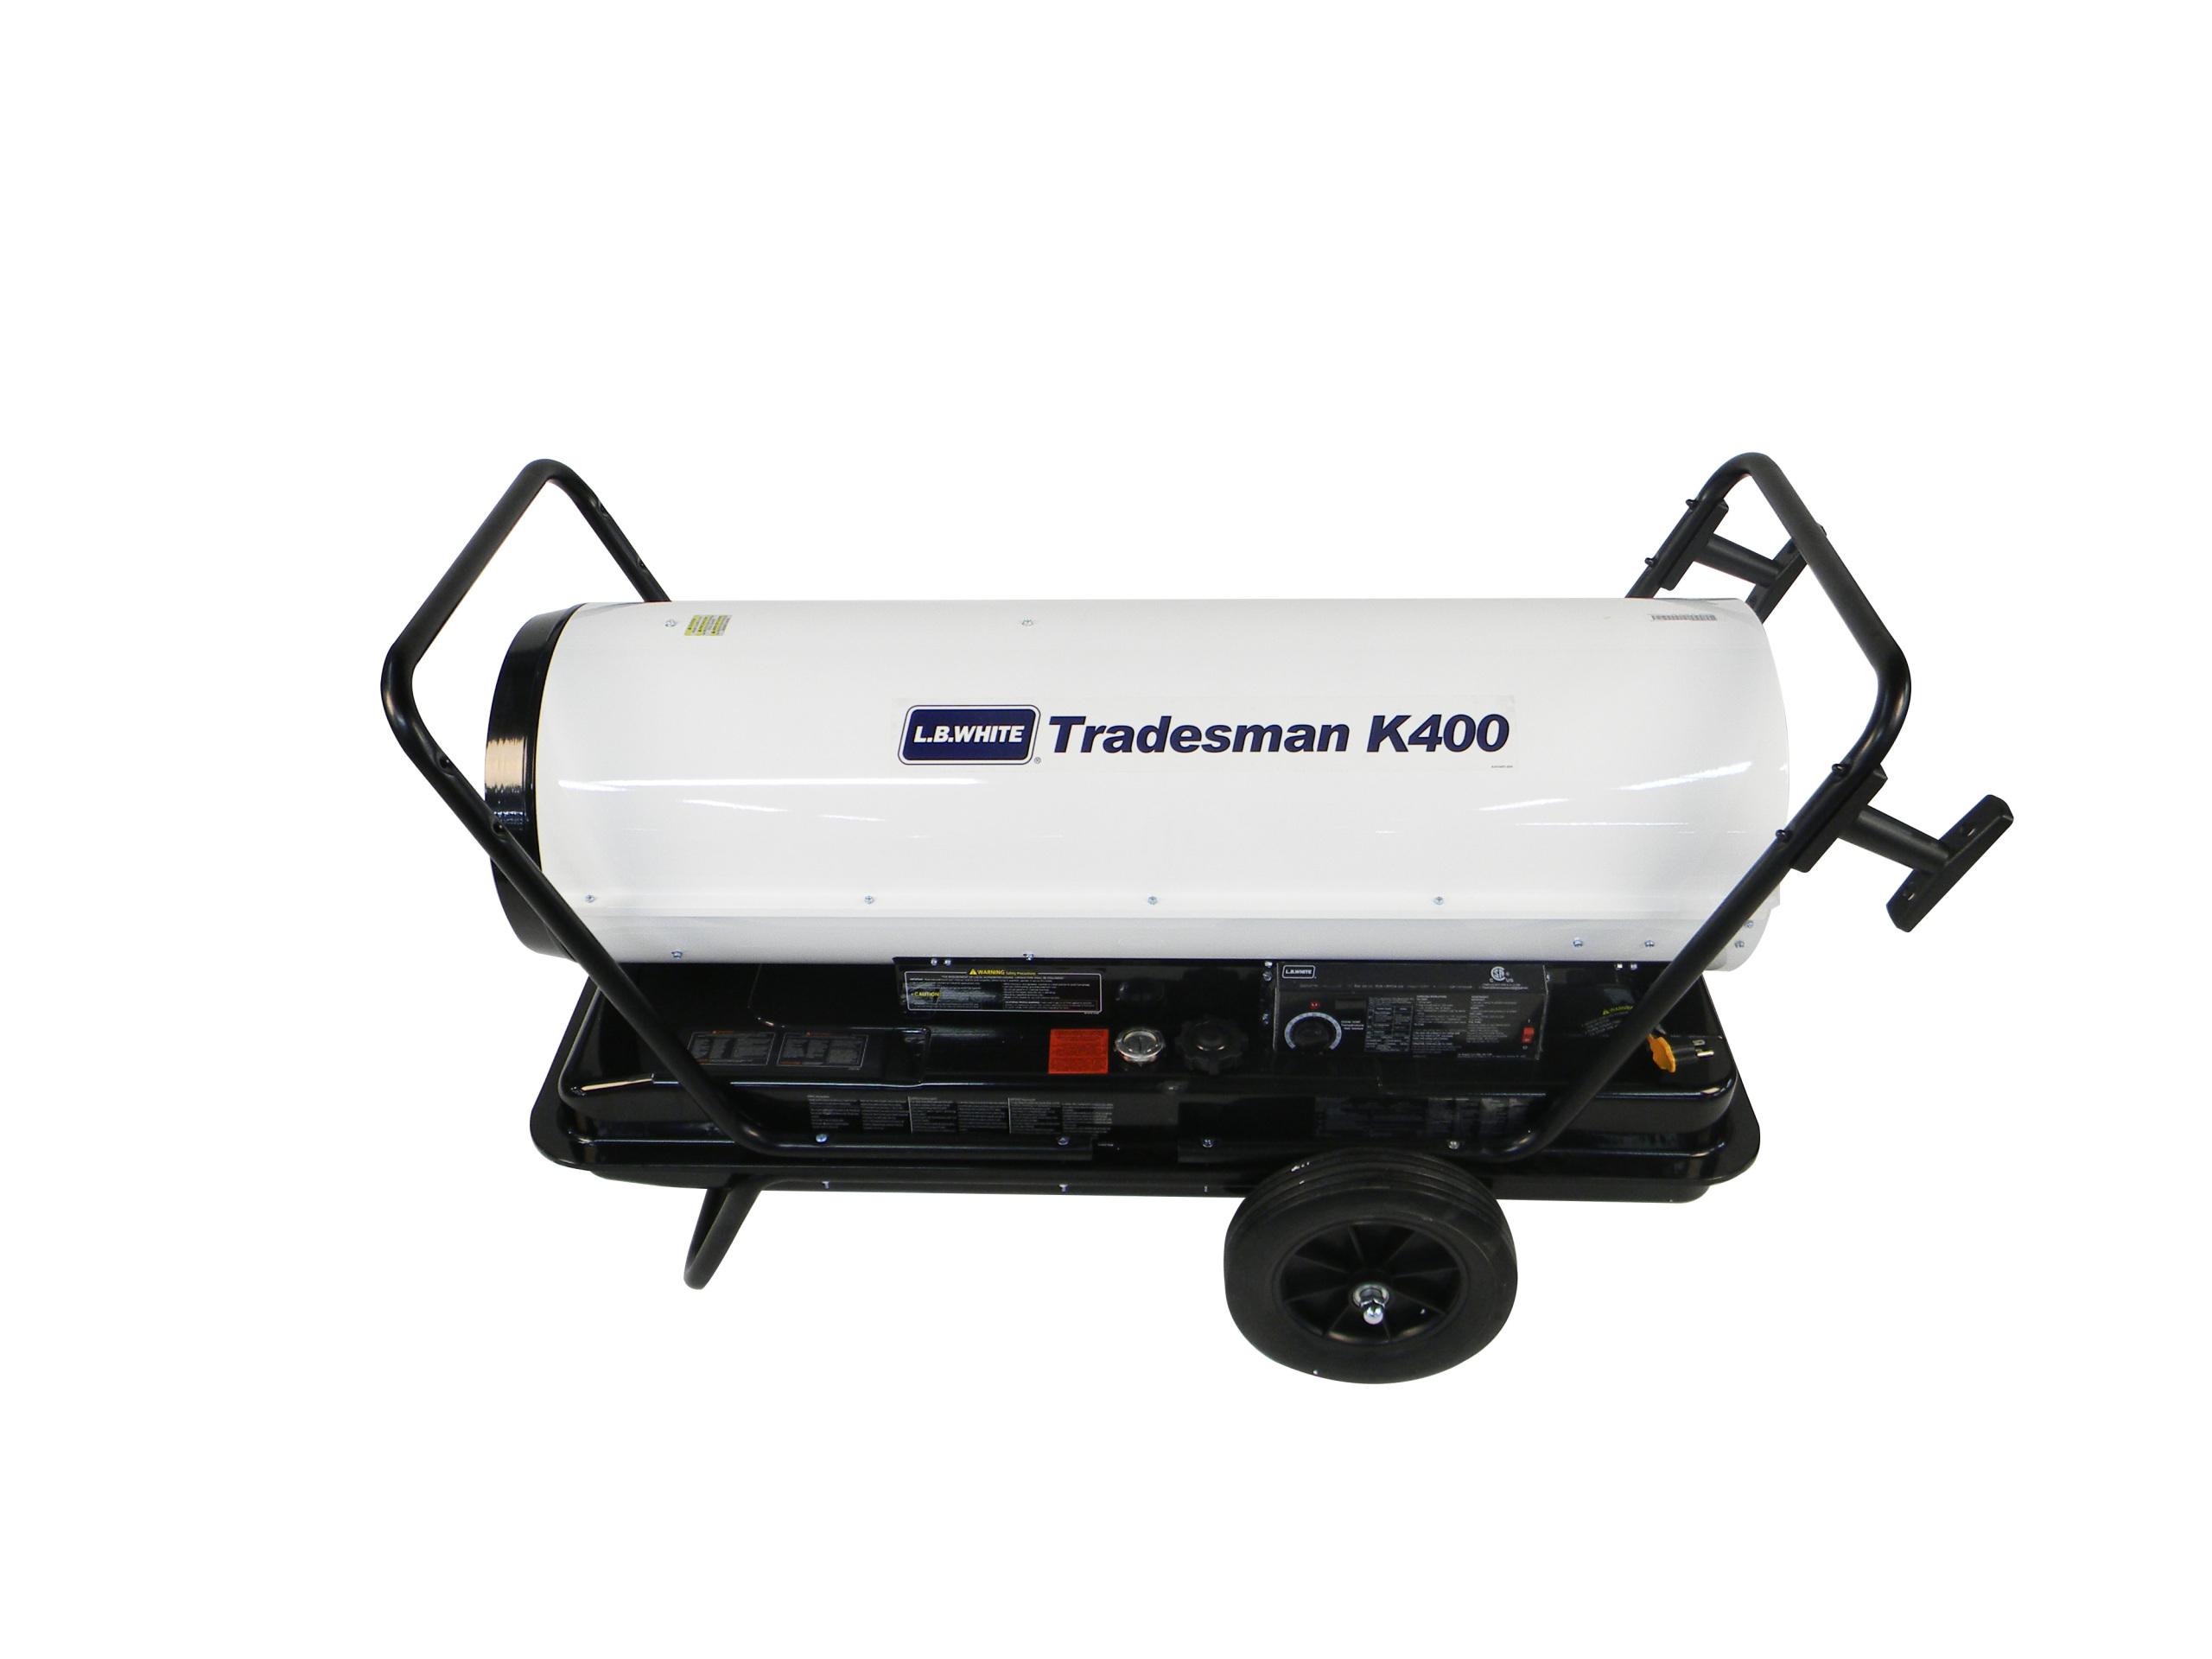 Lb White Tradesman K400 Heater 400 000 Btuh Kerosene 1